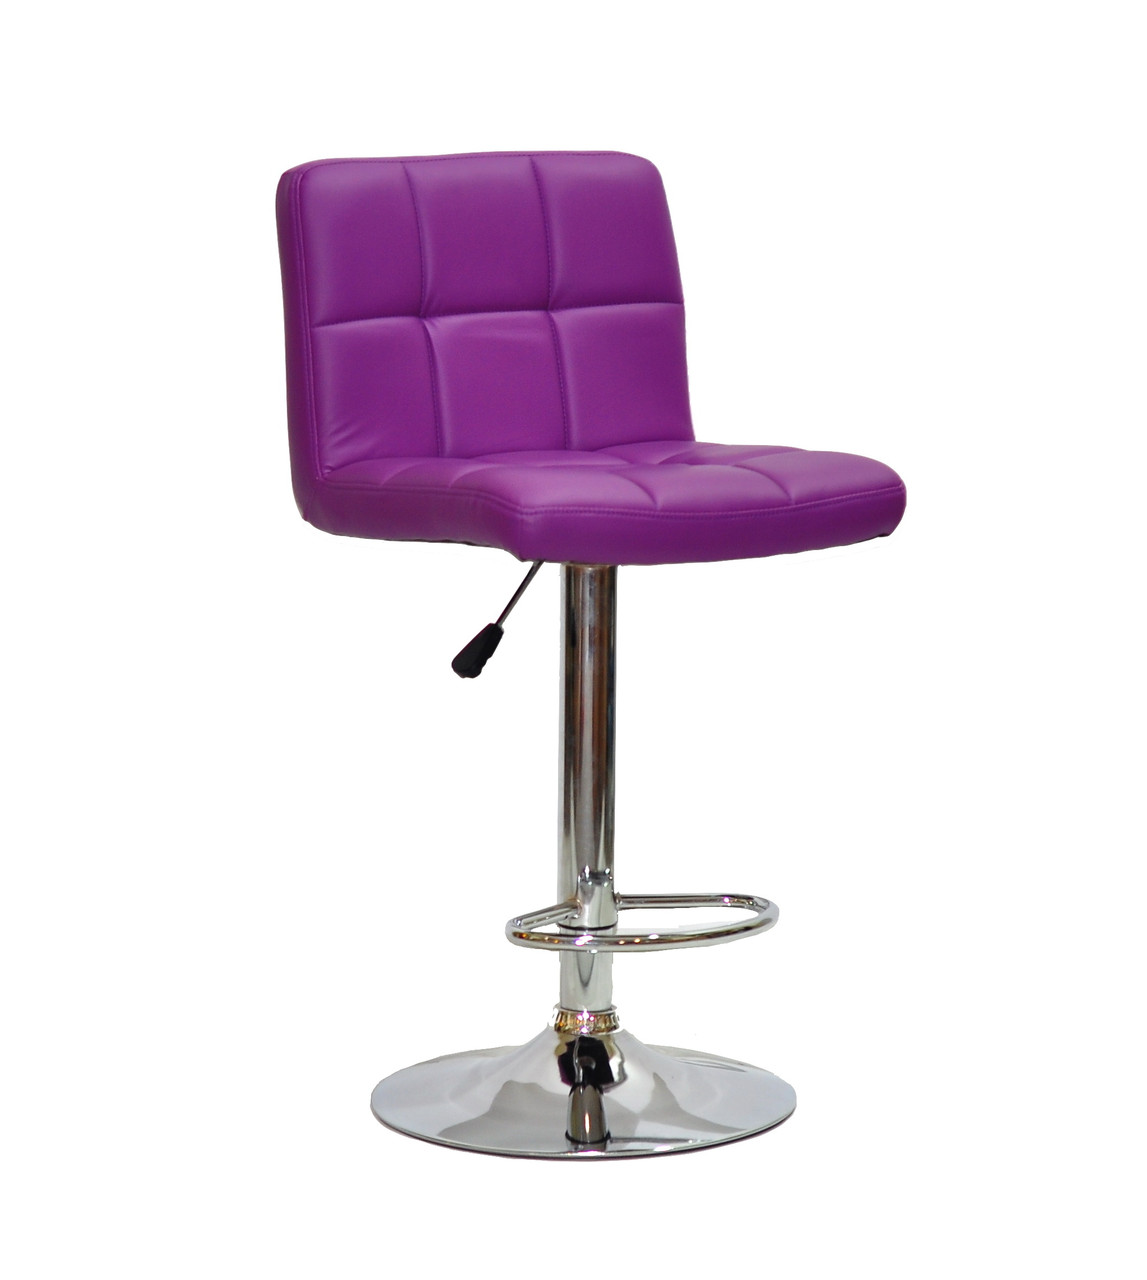 Стул визажиста Арно пурпурный кожзам + хром/ Arno  BAR CH - Base